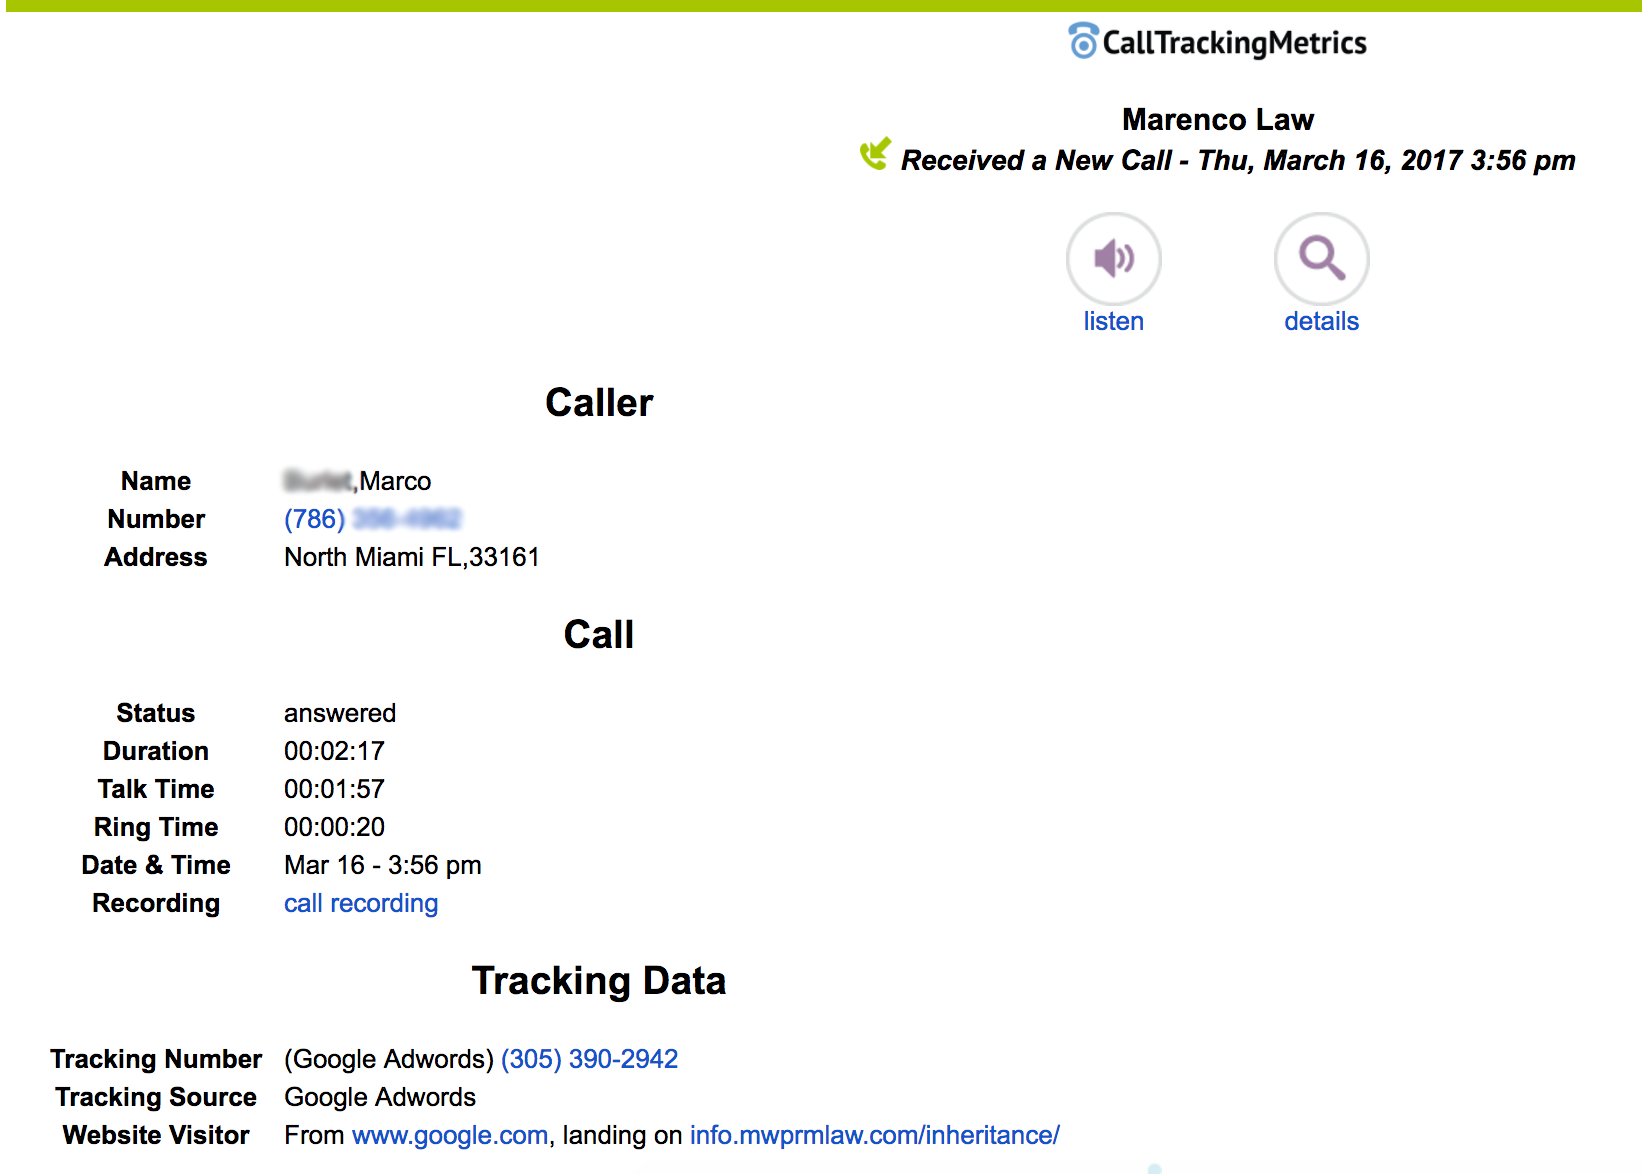 calltracking.png